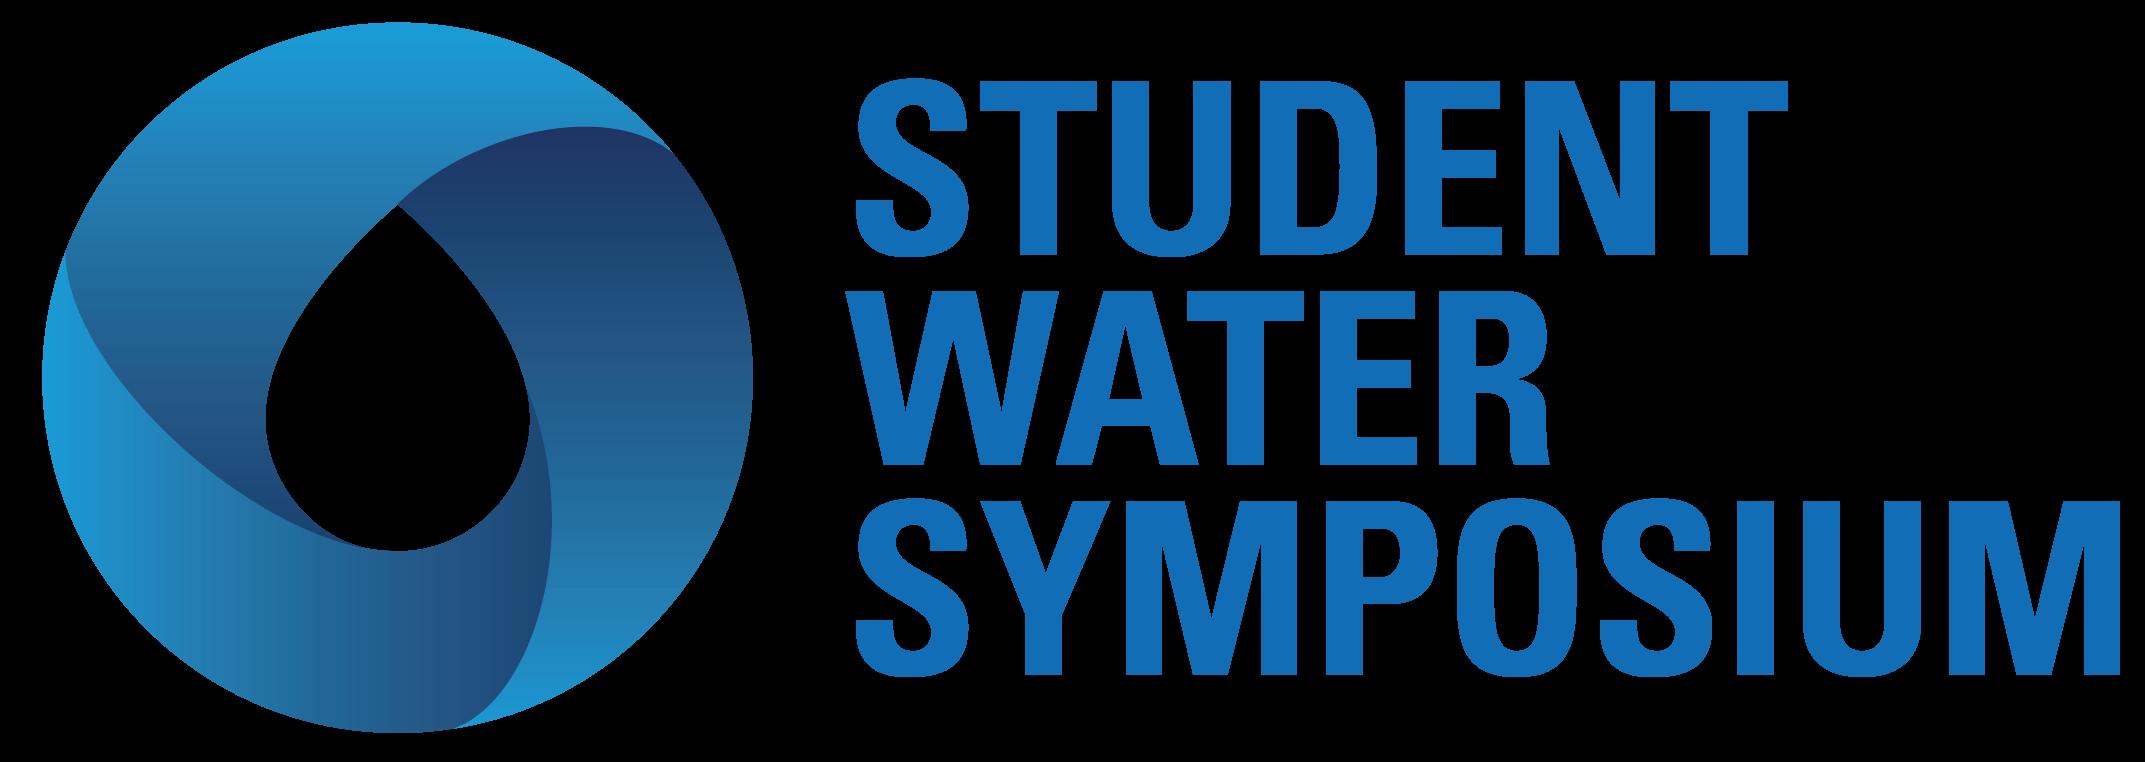 Student Water Symposium, NAU